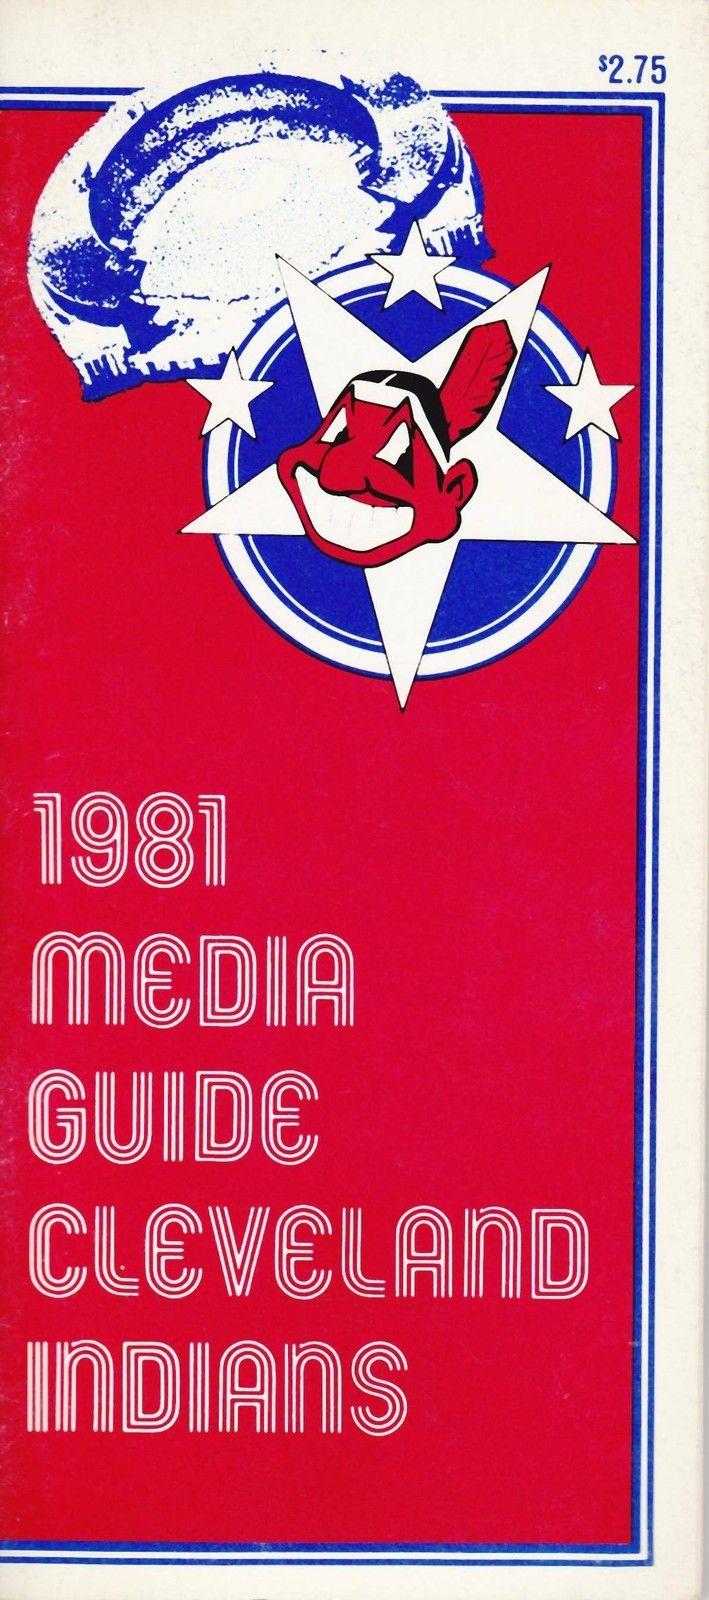 1981 CLEVELAND INDIANS MAJOR LEAGUE BASEBALL MEDIA GUIDE | eBay